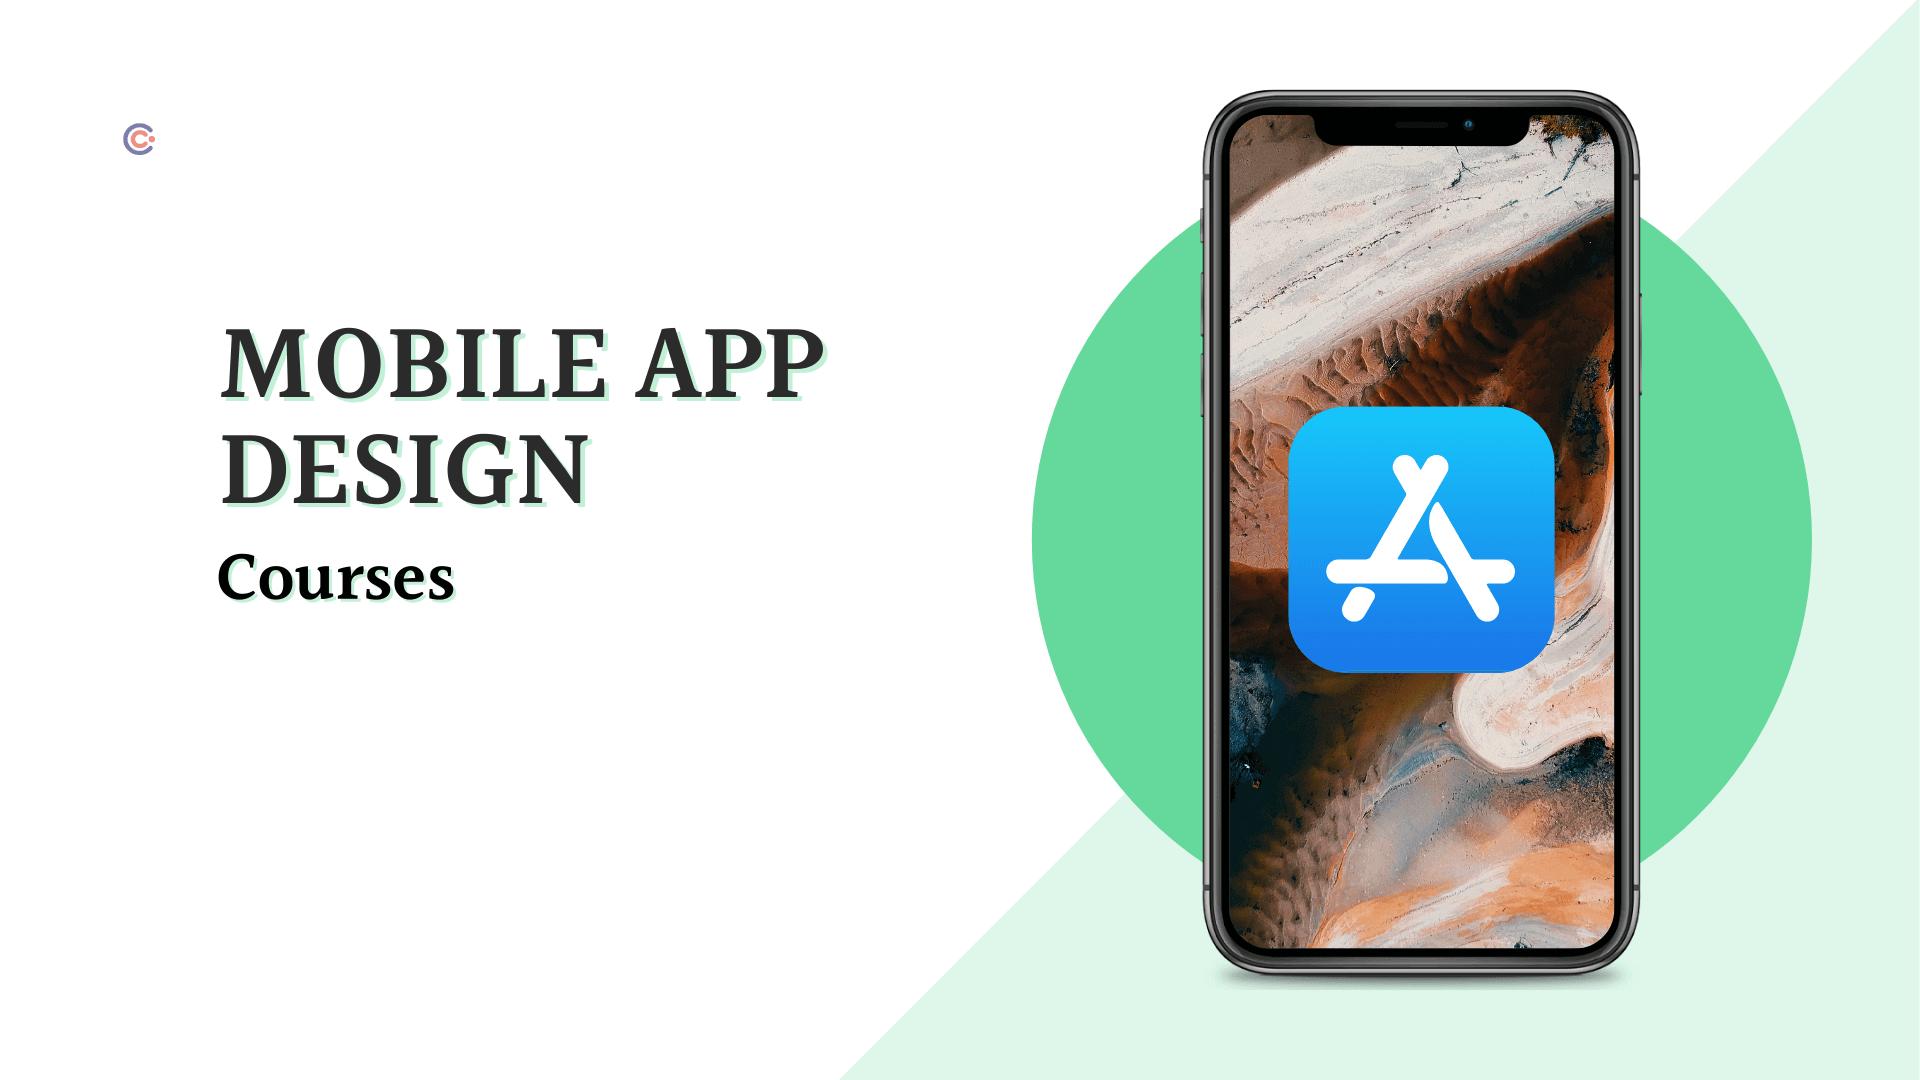 7 Best Mobile App Design Courses - Learn Mobile App Design Online